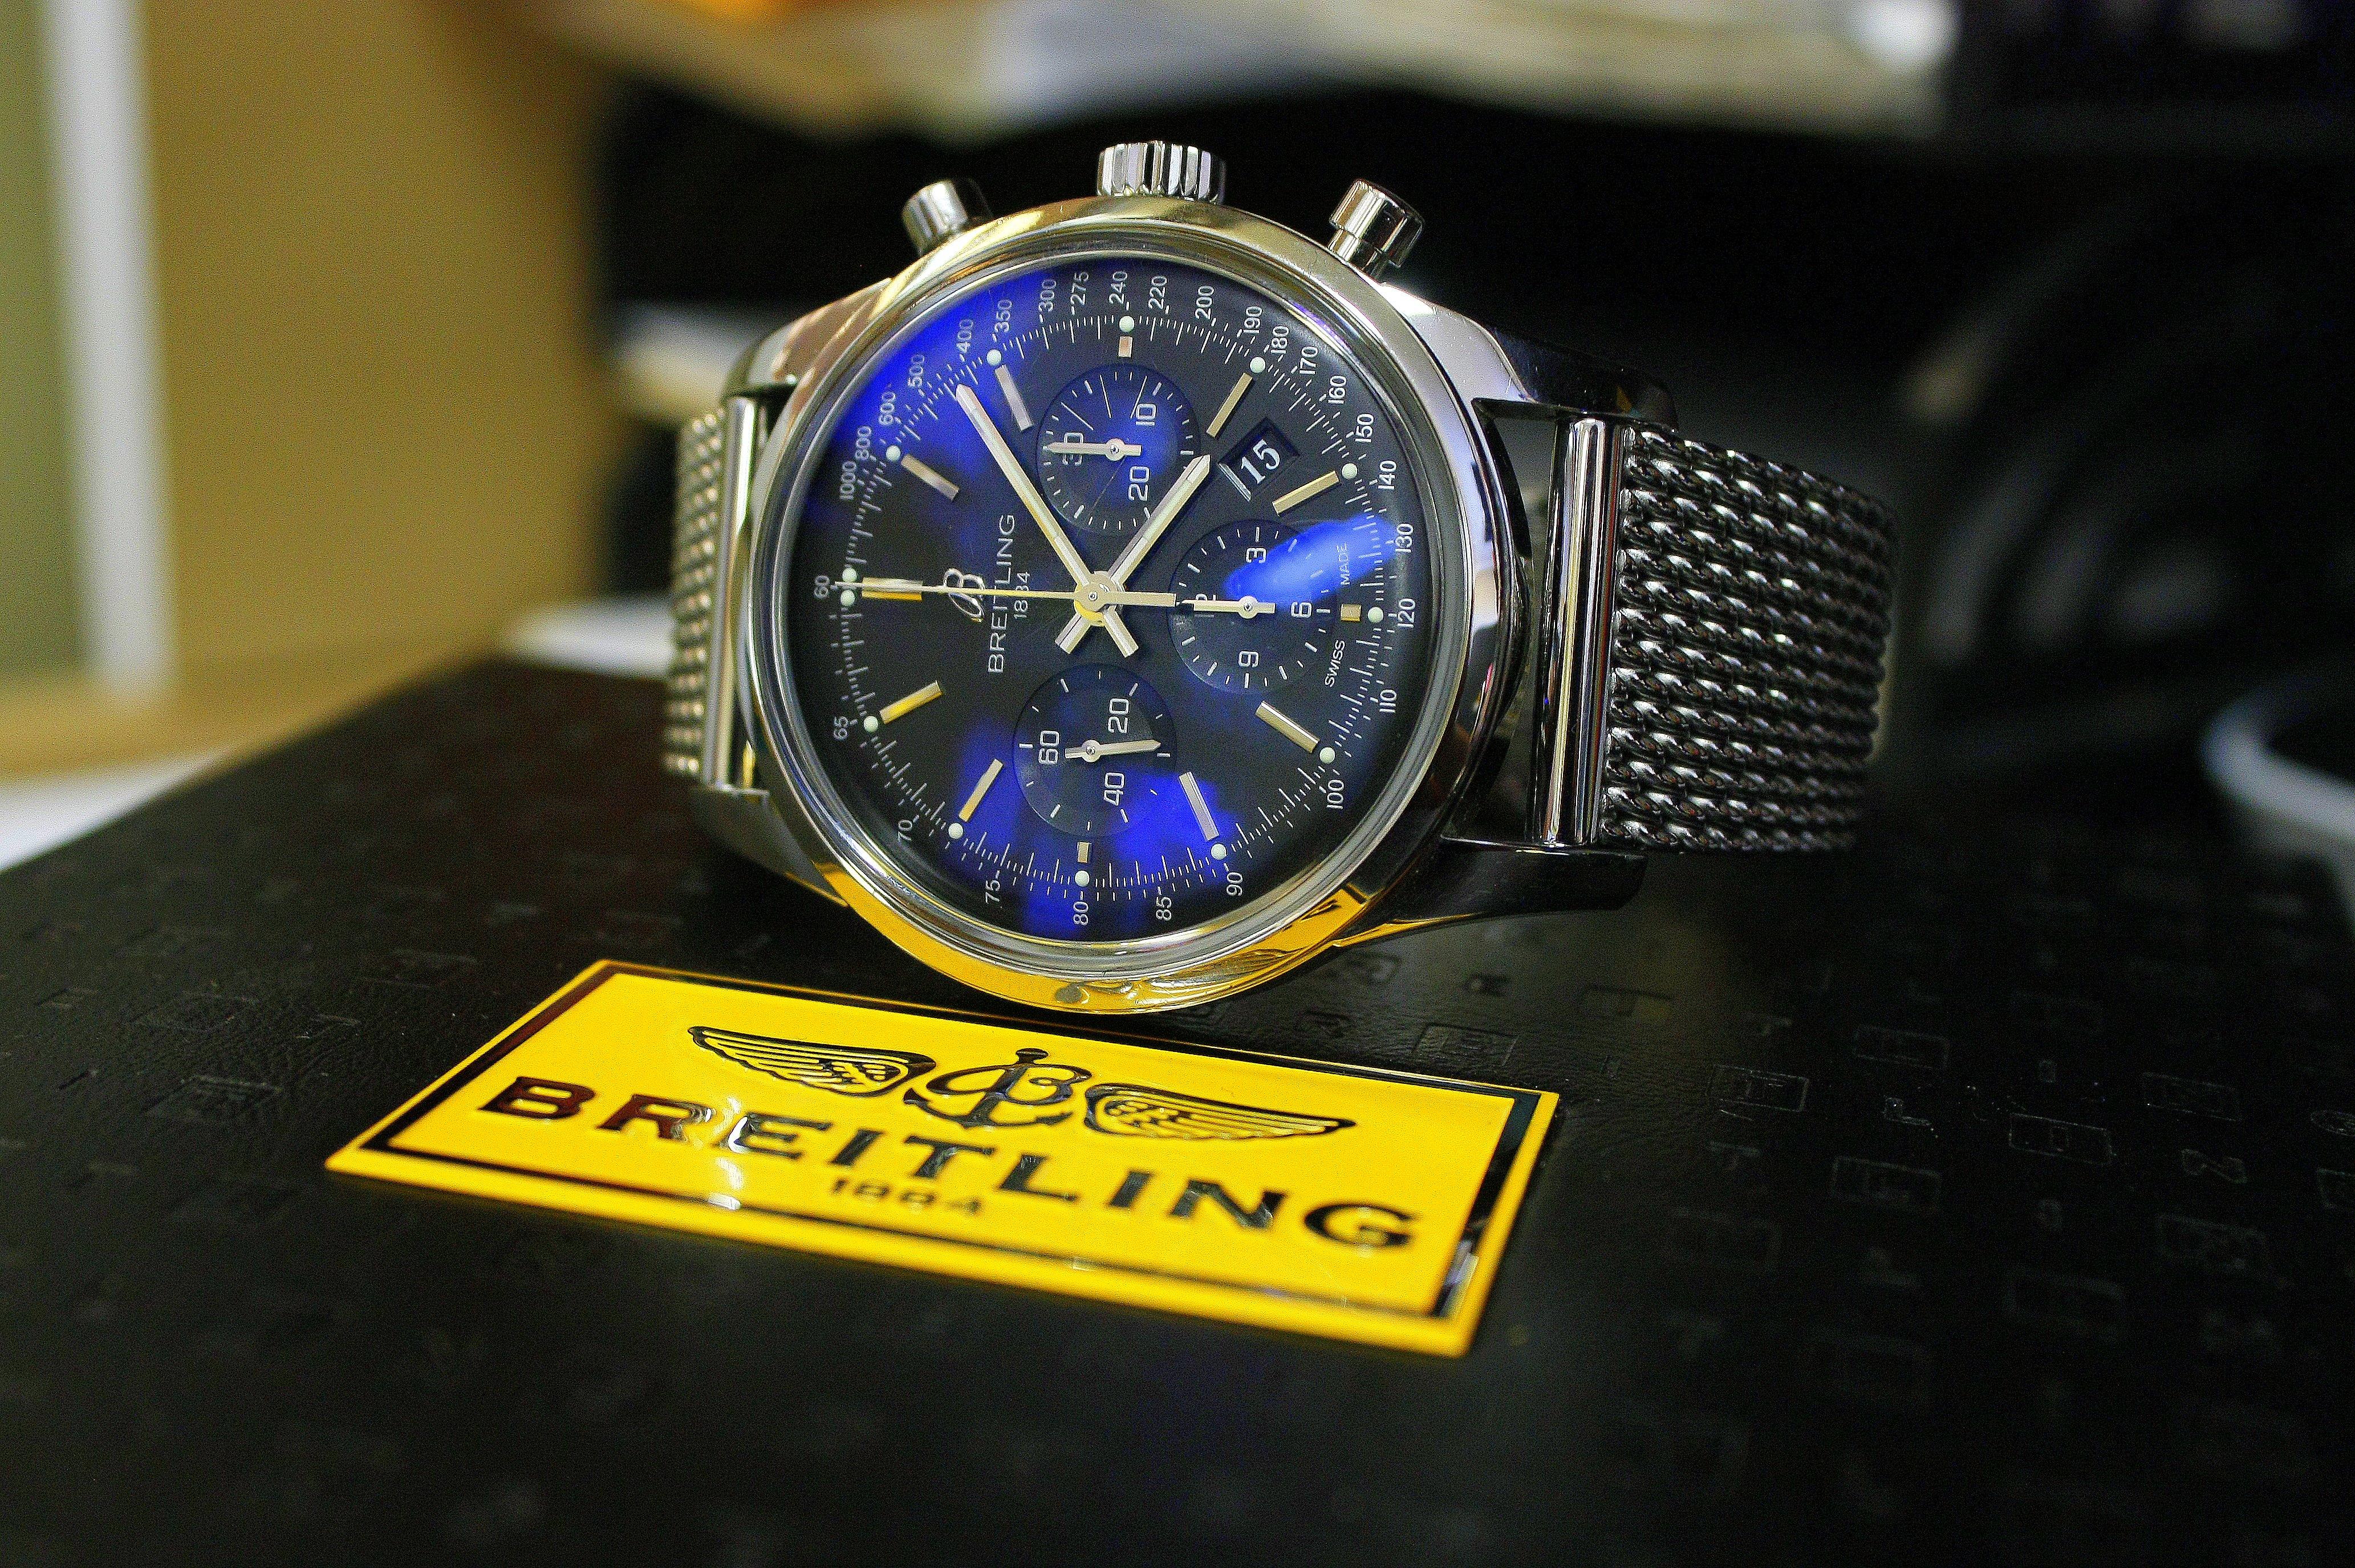 Breitling Transocean - $4,200